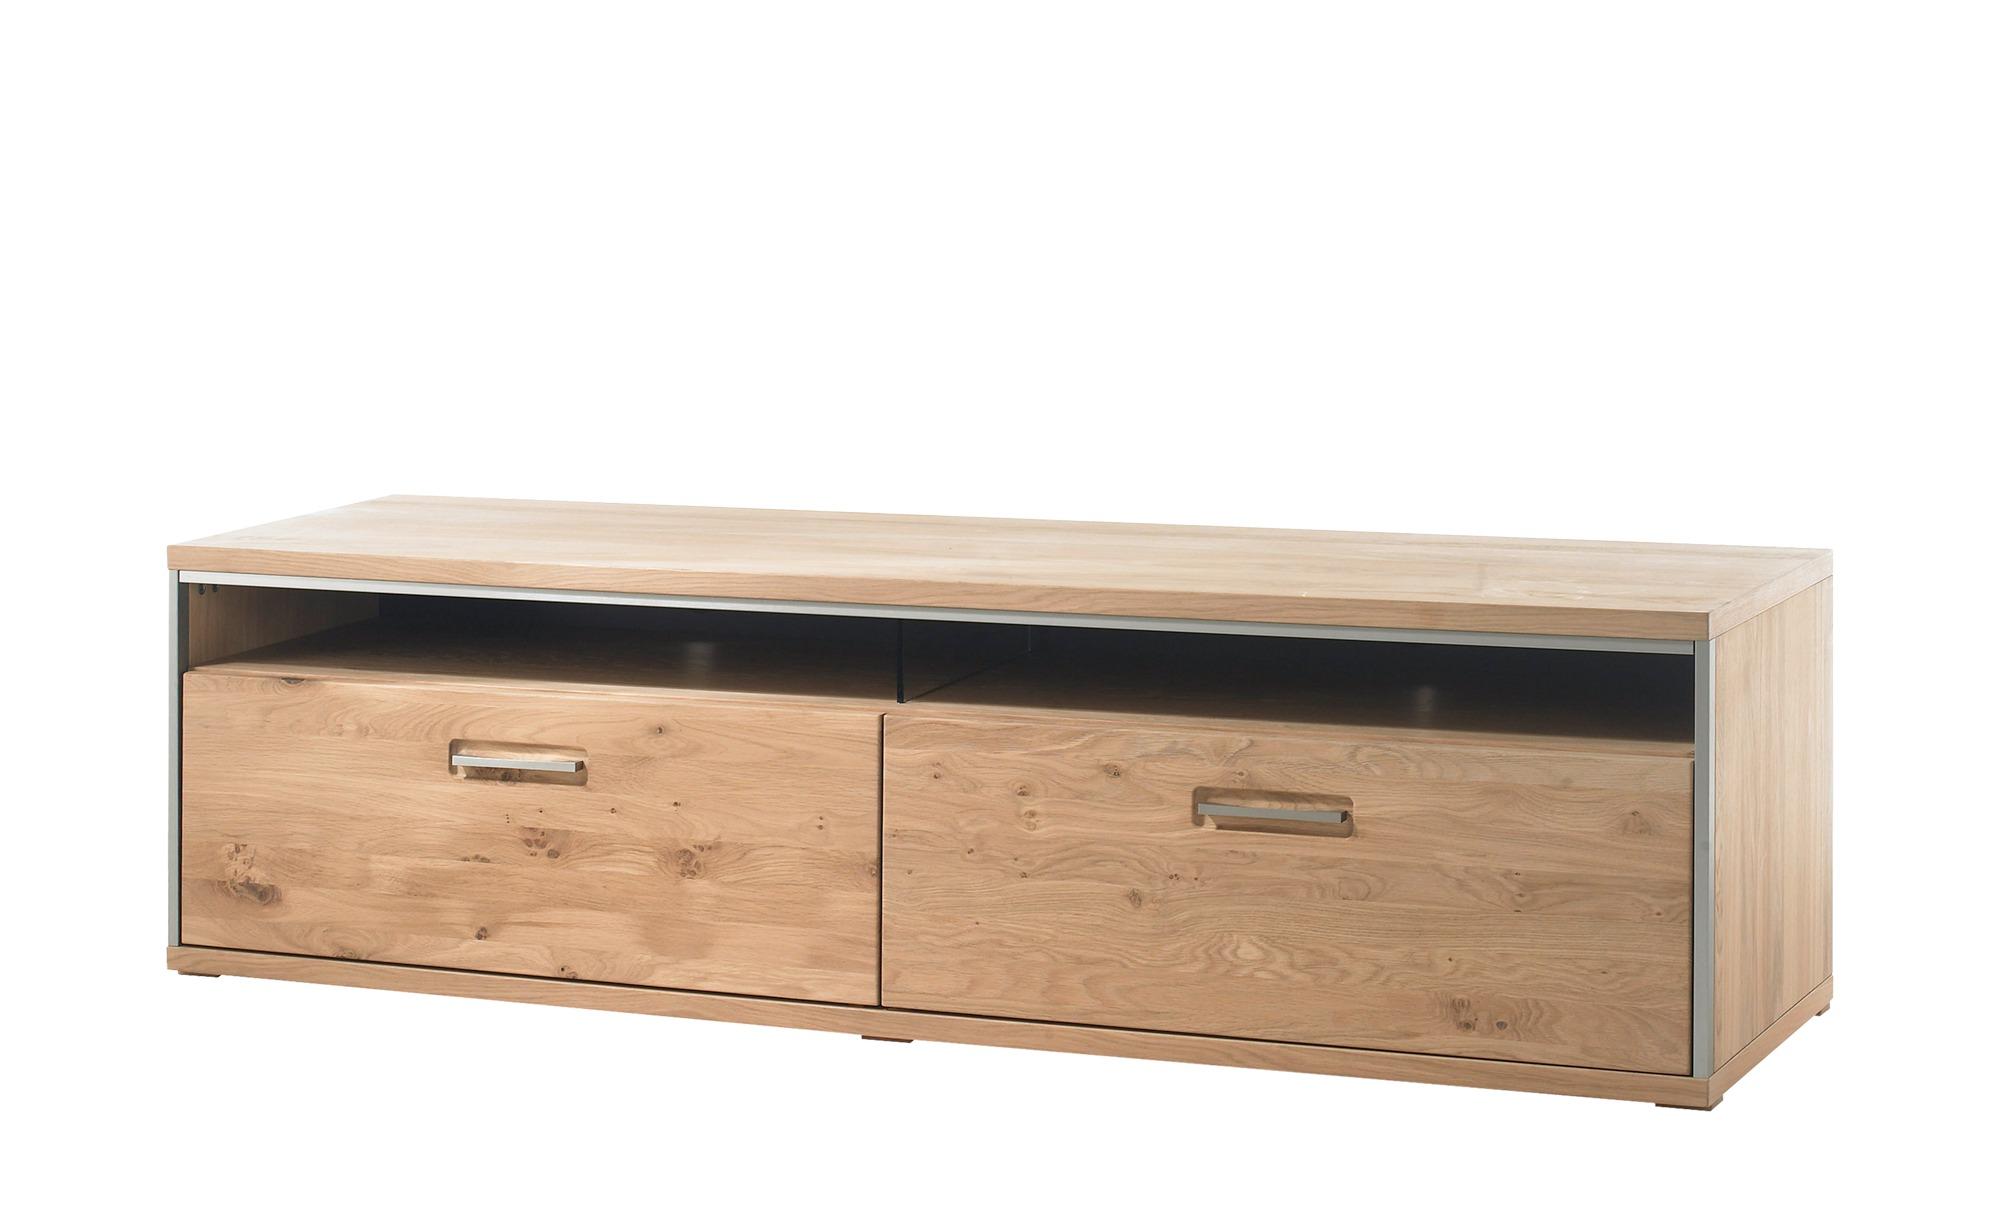 Woodford TV-Element Felino Breite: 184 Cm Höhe: 51 Cm